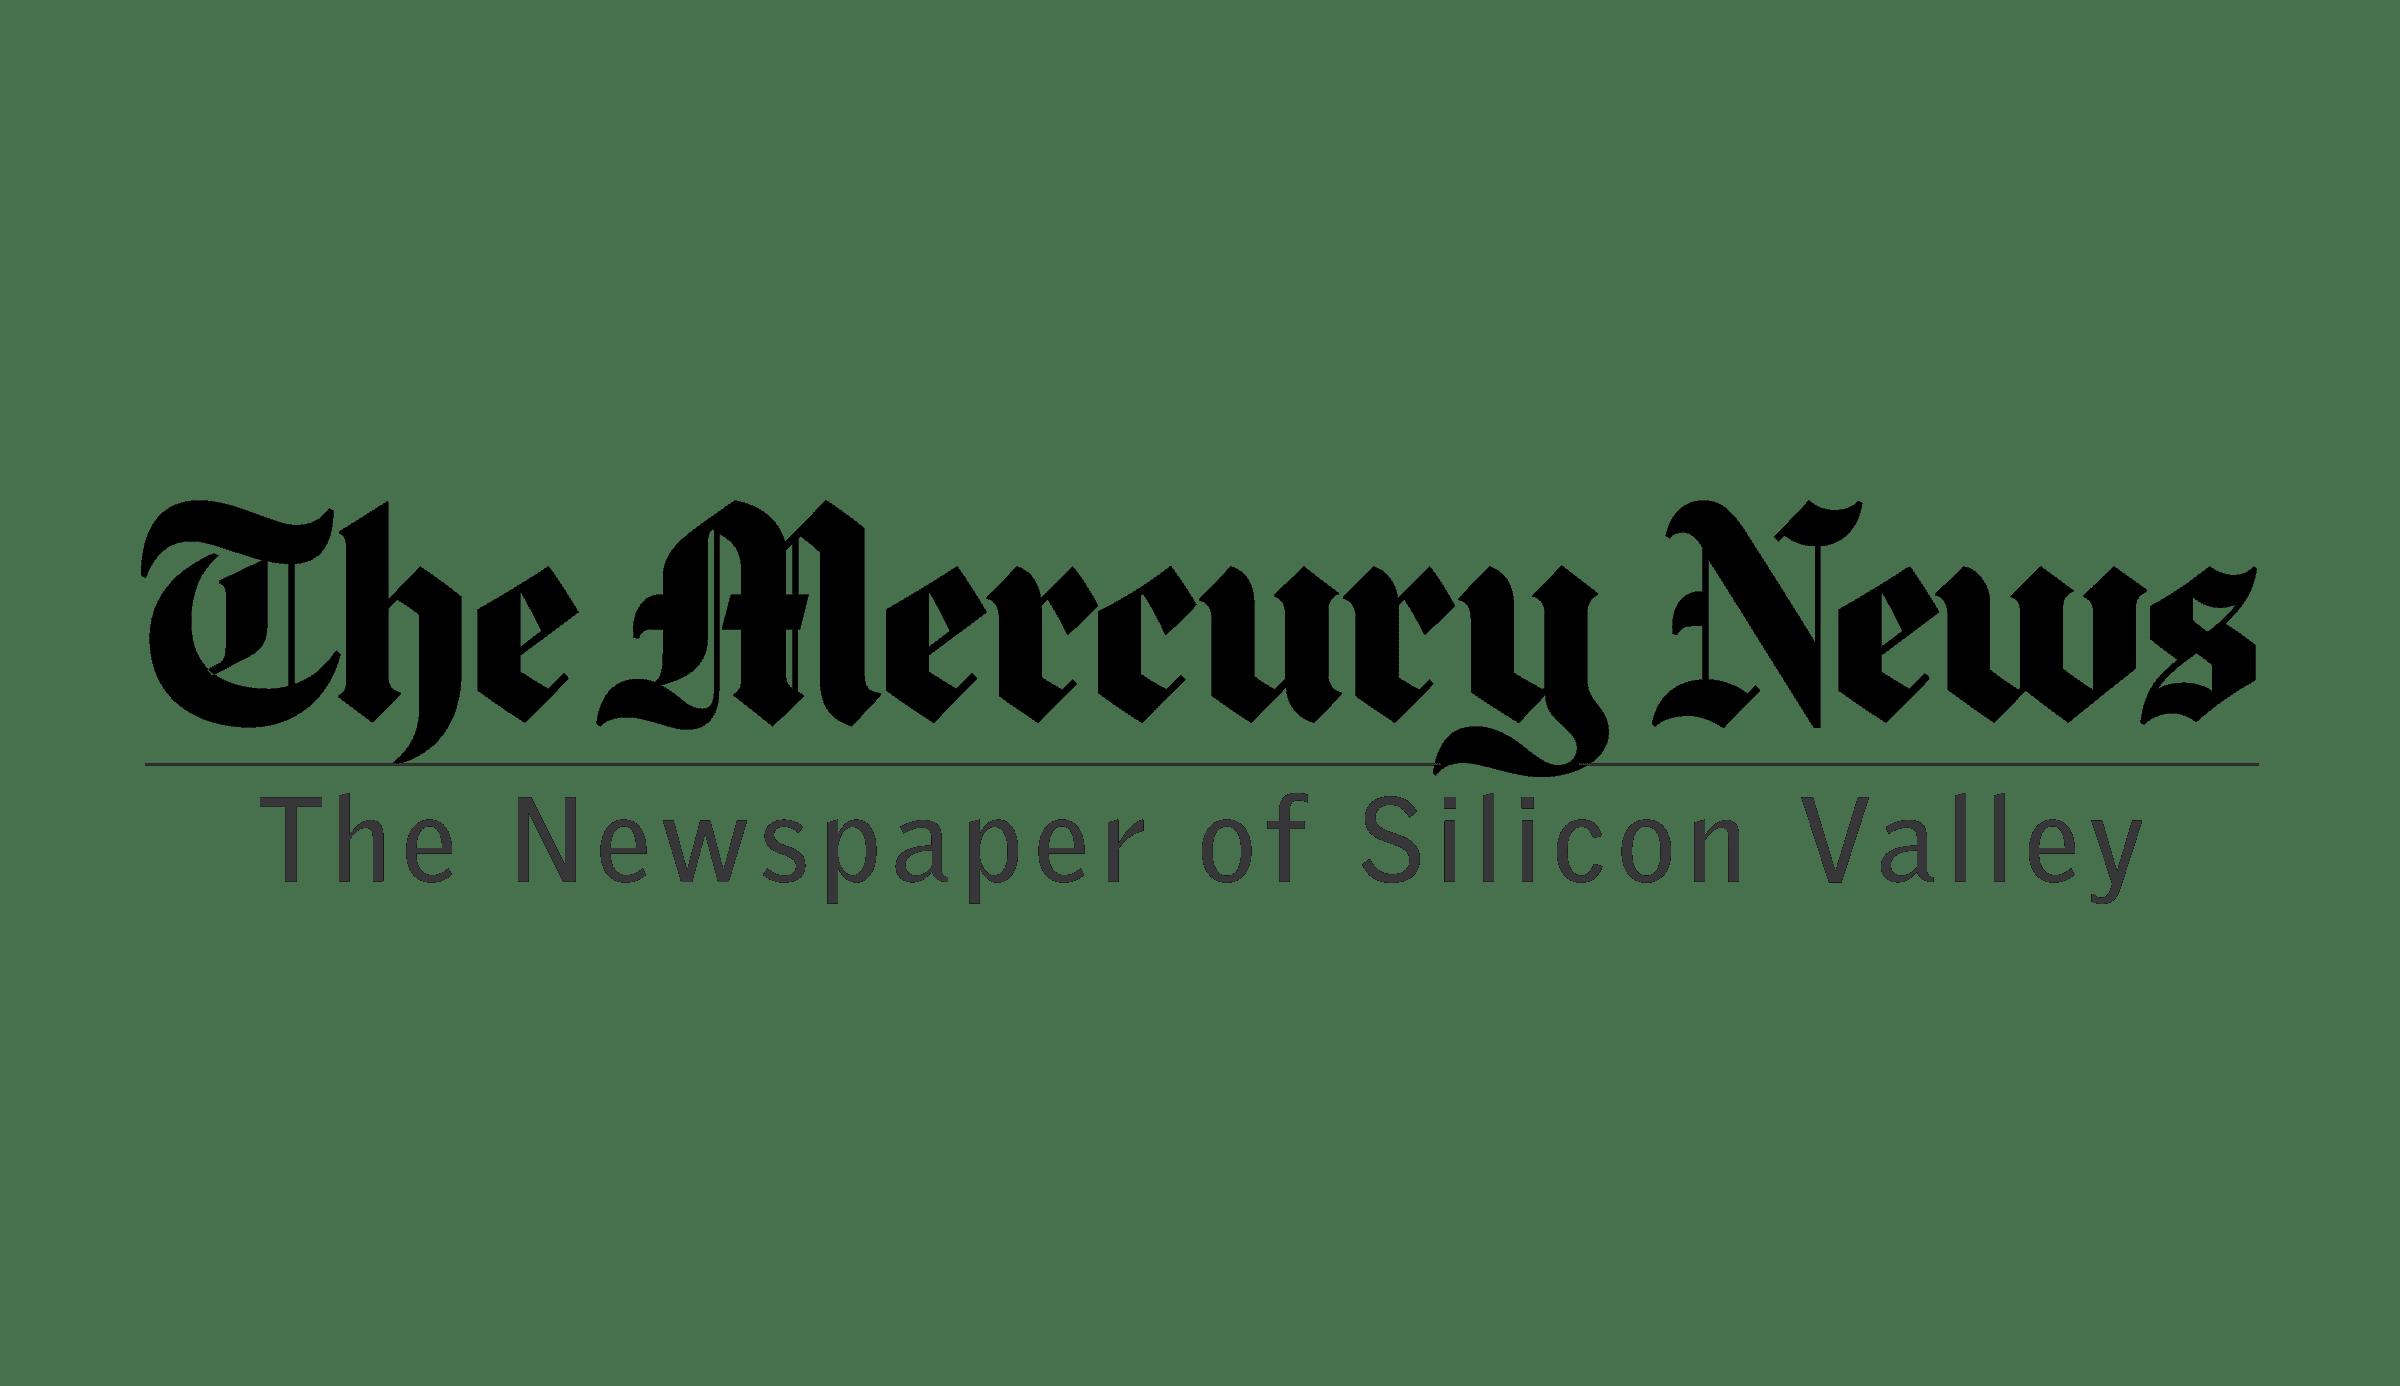 the-mercury-news-logo-png-transparent